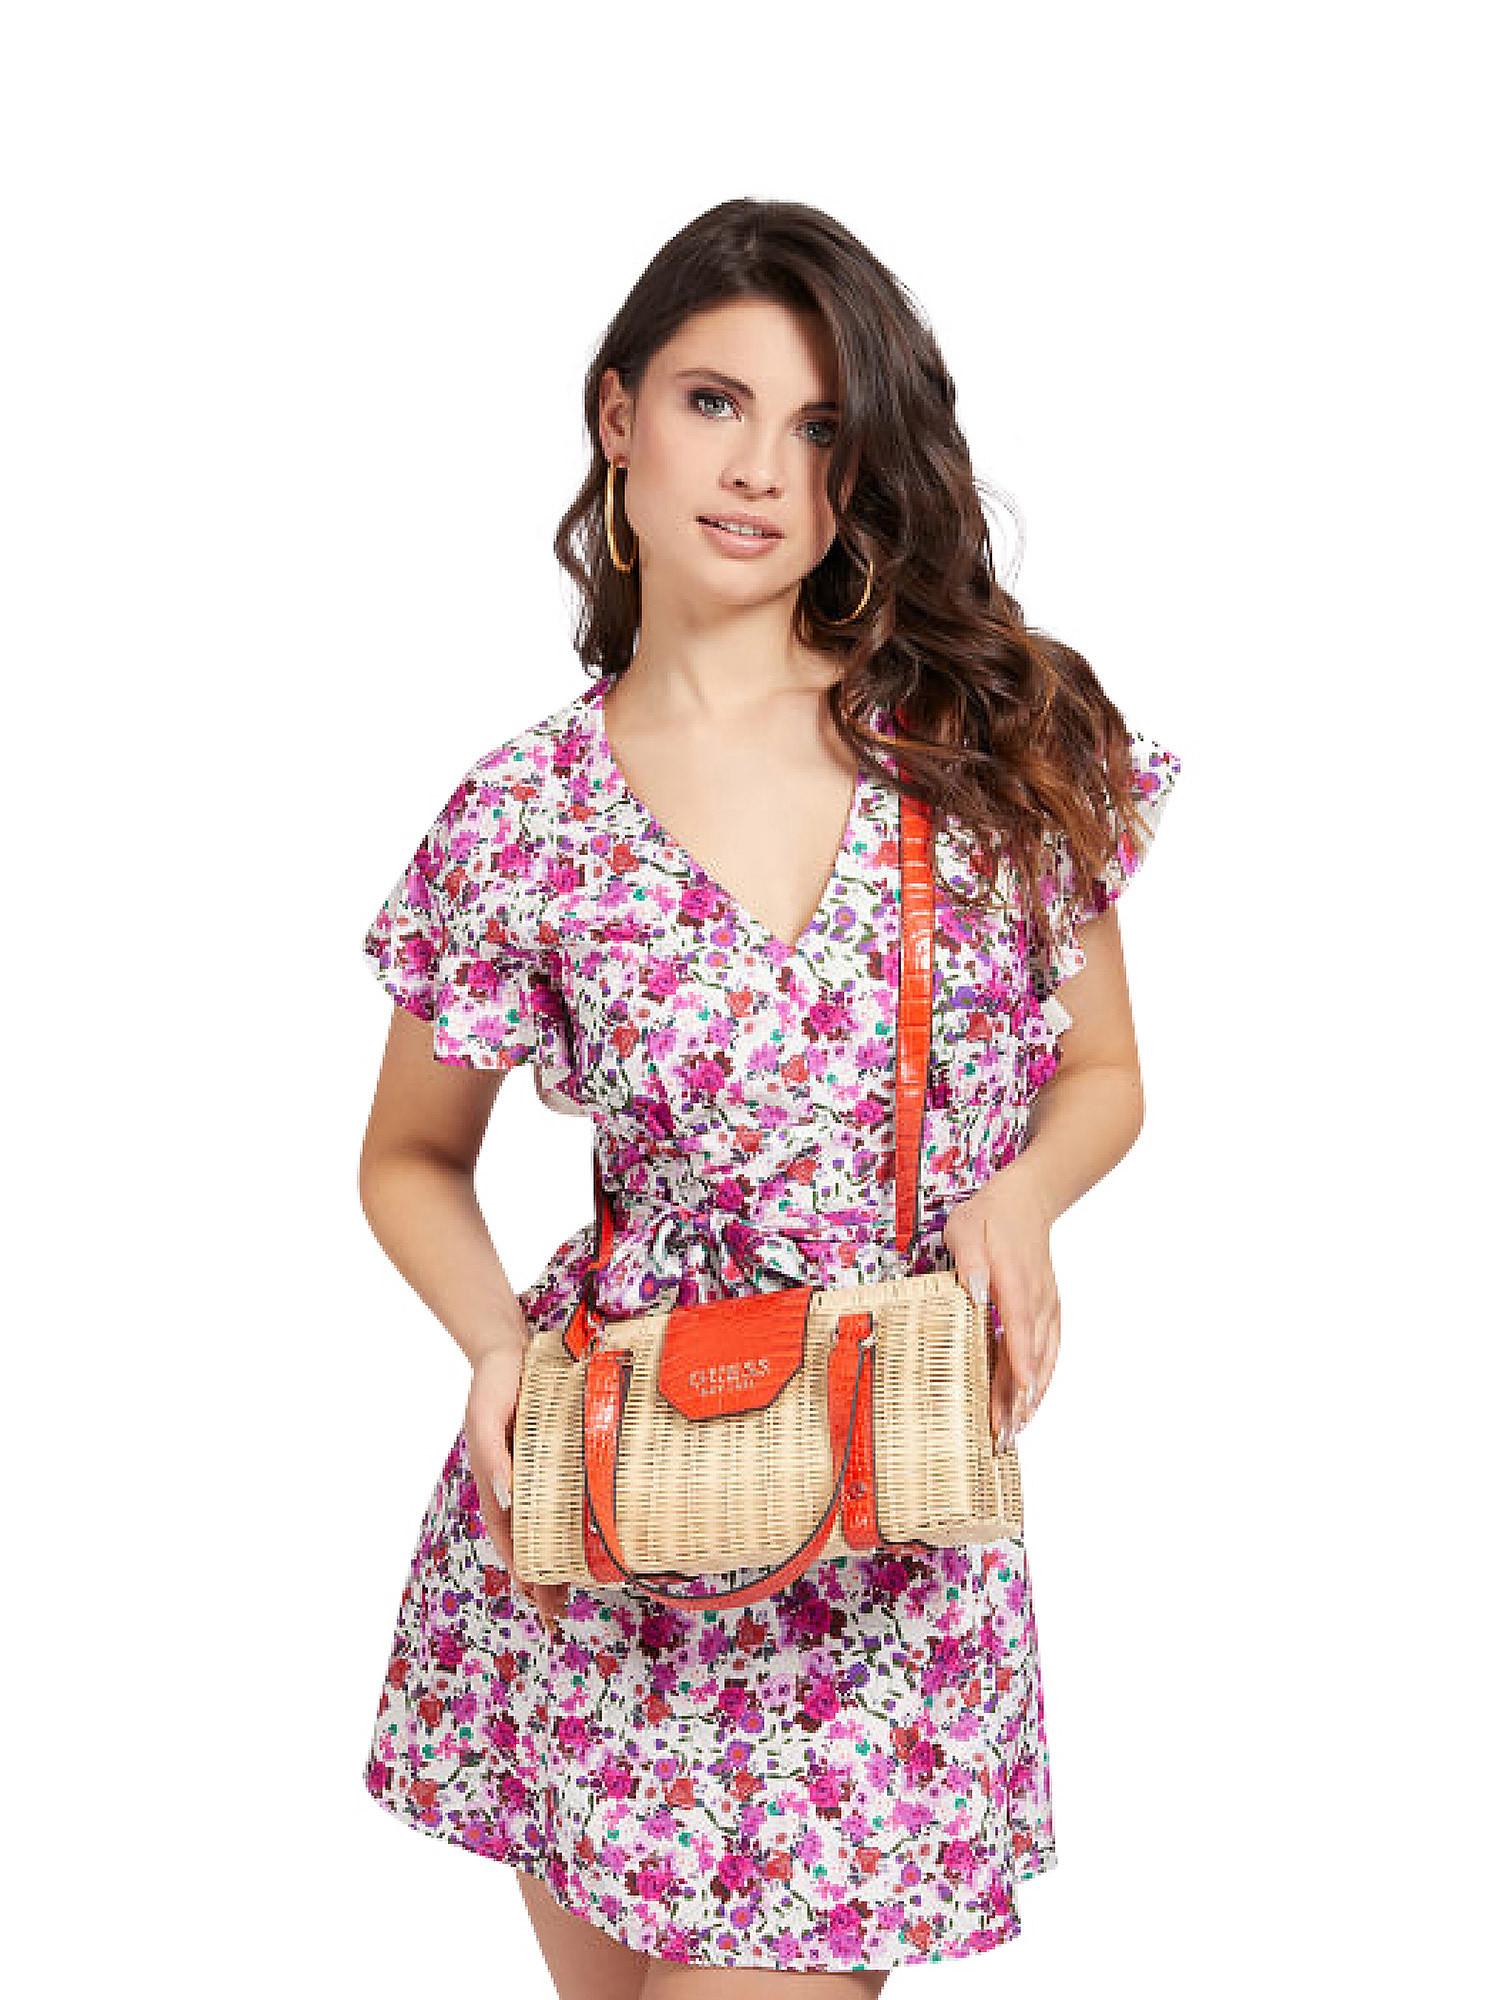 Paloma Satchel Bag, Arancione, large image number 2